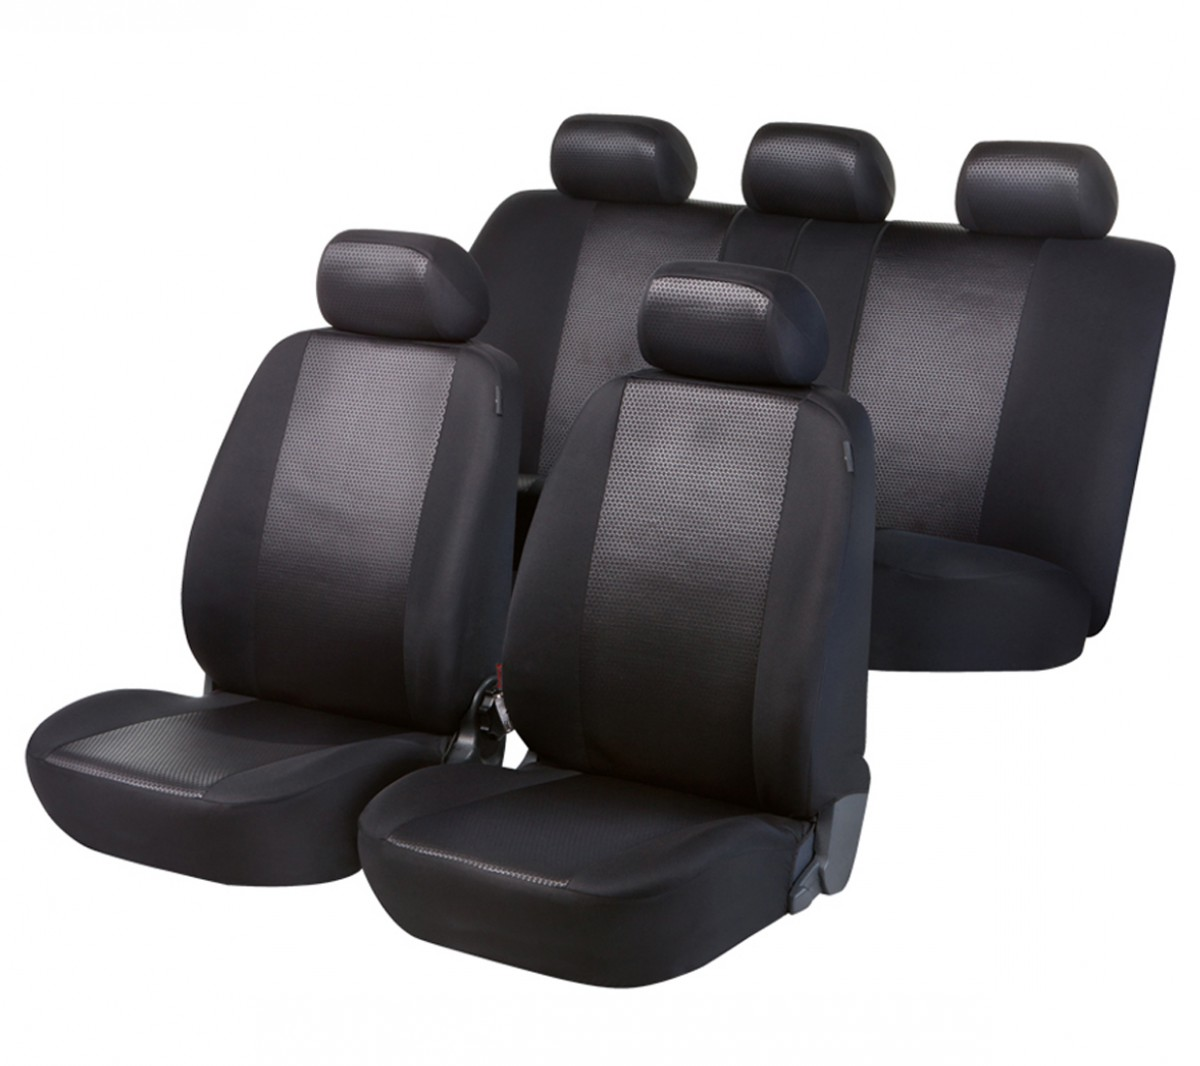 autositzbezug schonbezug komplett set vw caddy schwarz. Black Bedroom Furniture Sets. Home Design Ideas